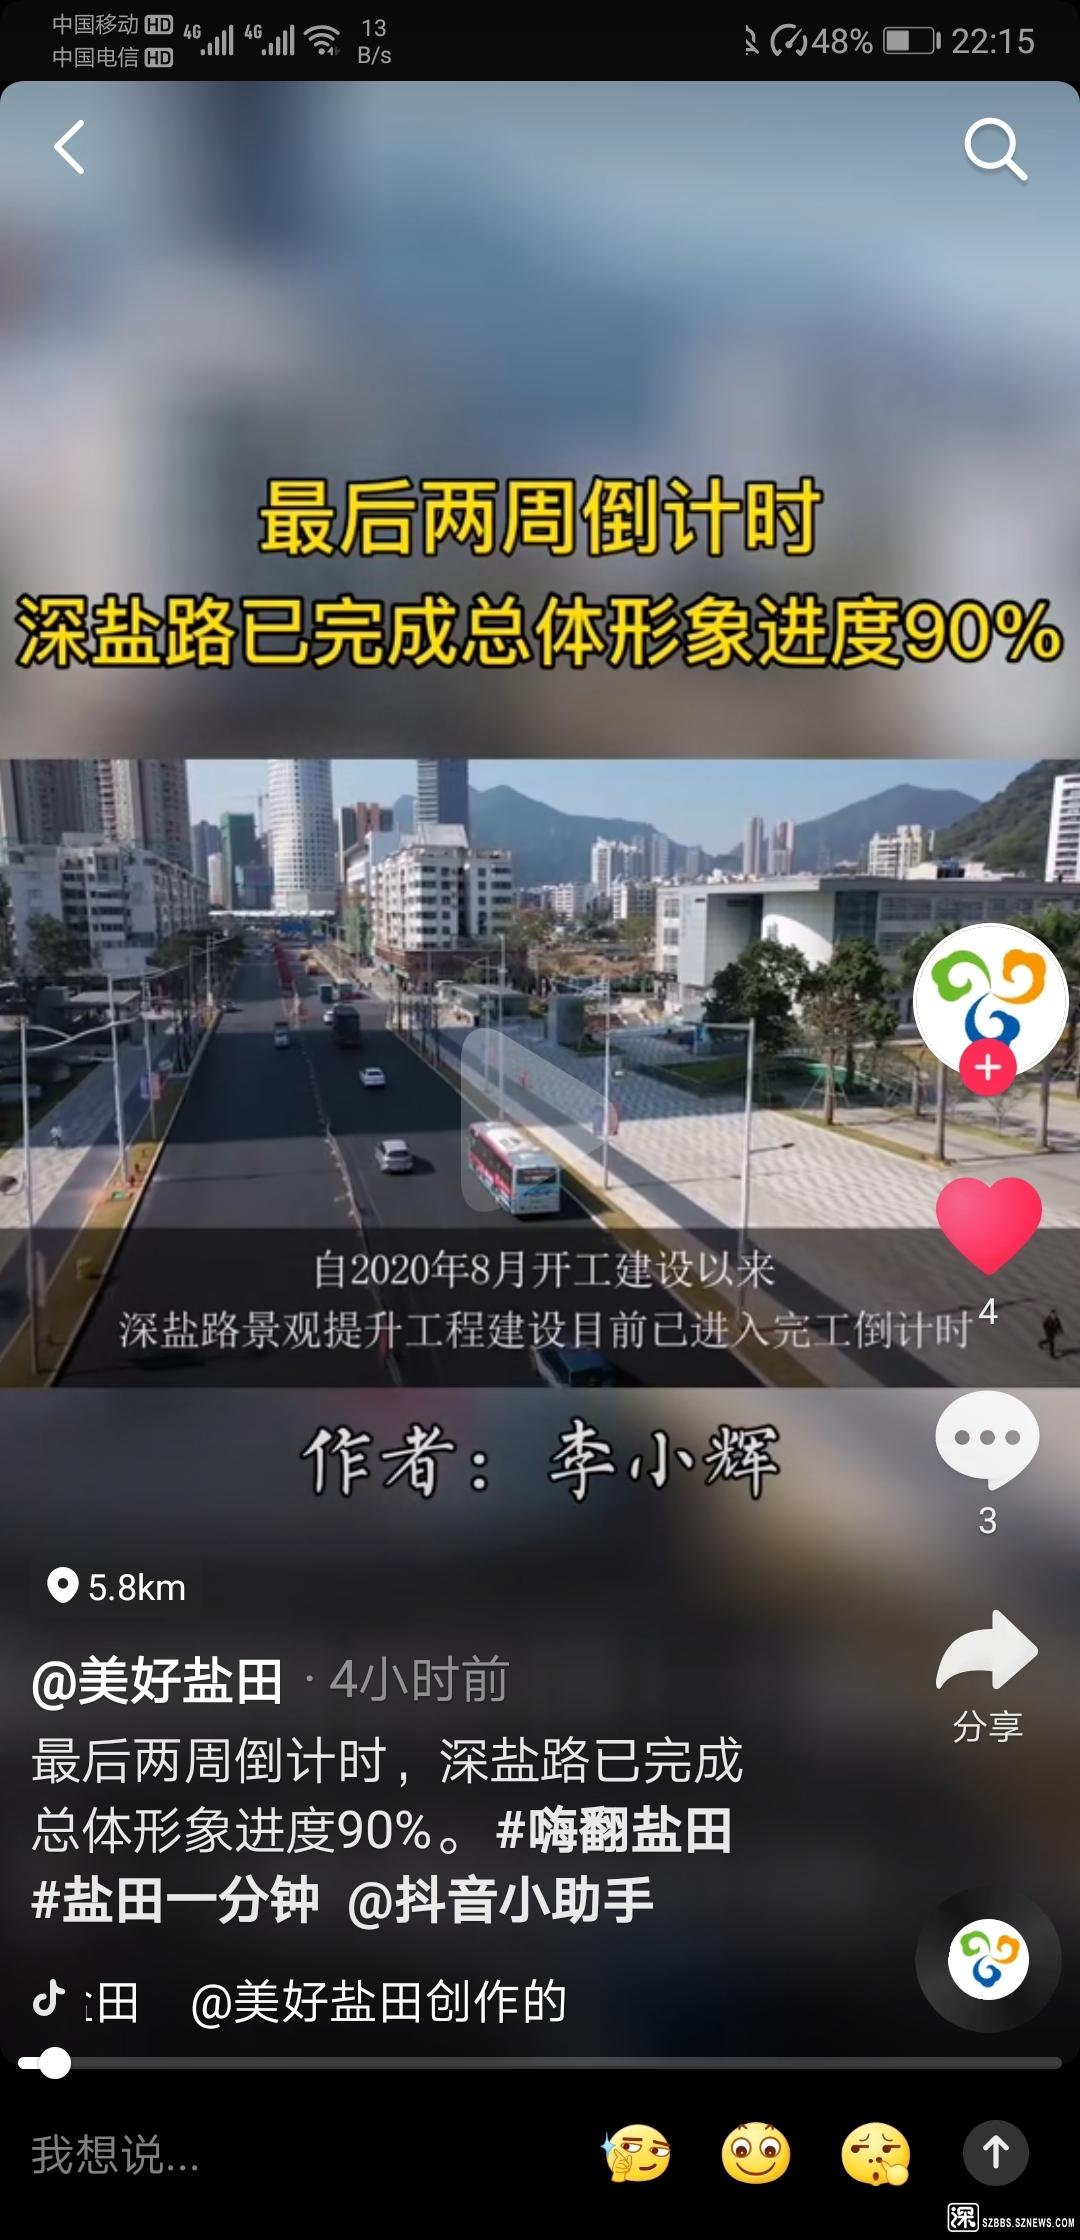 Screenshot_20210115_221557_com.ss.android.ugc.aweme.jpg